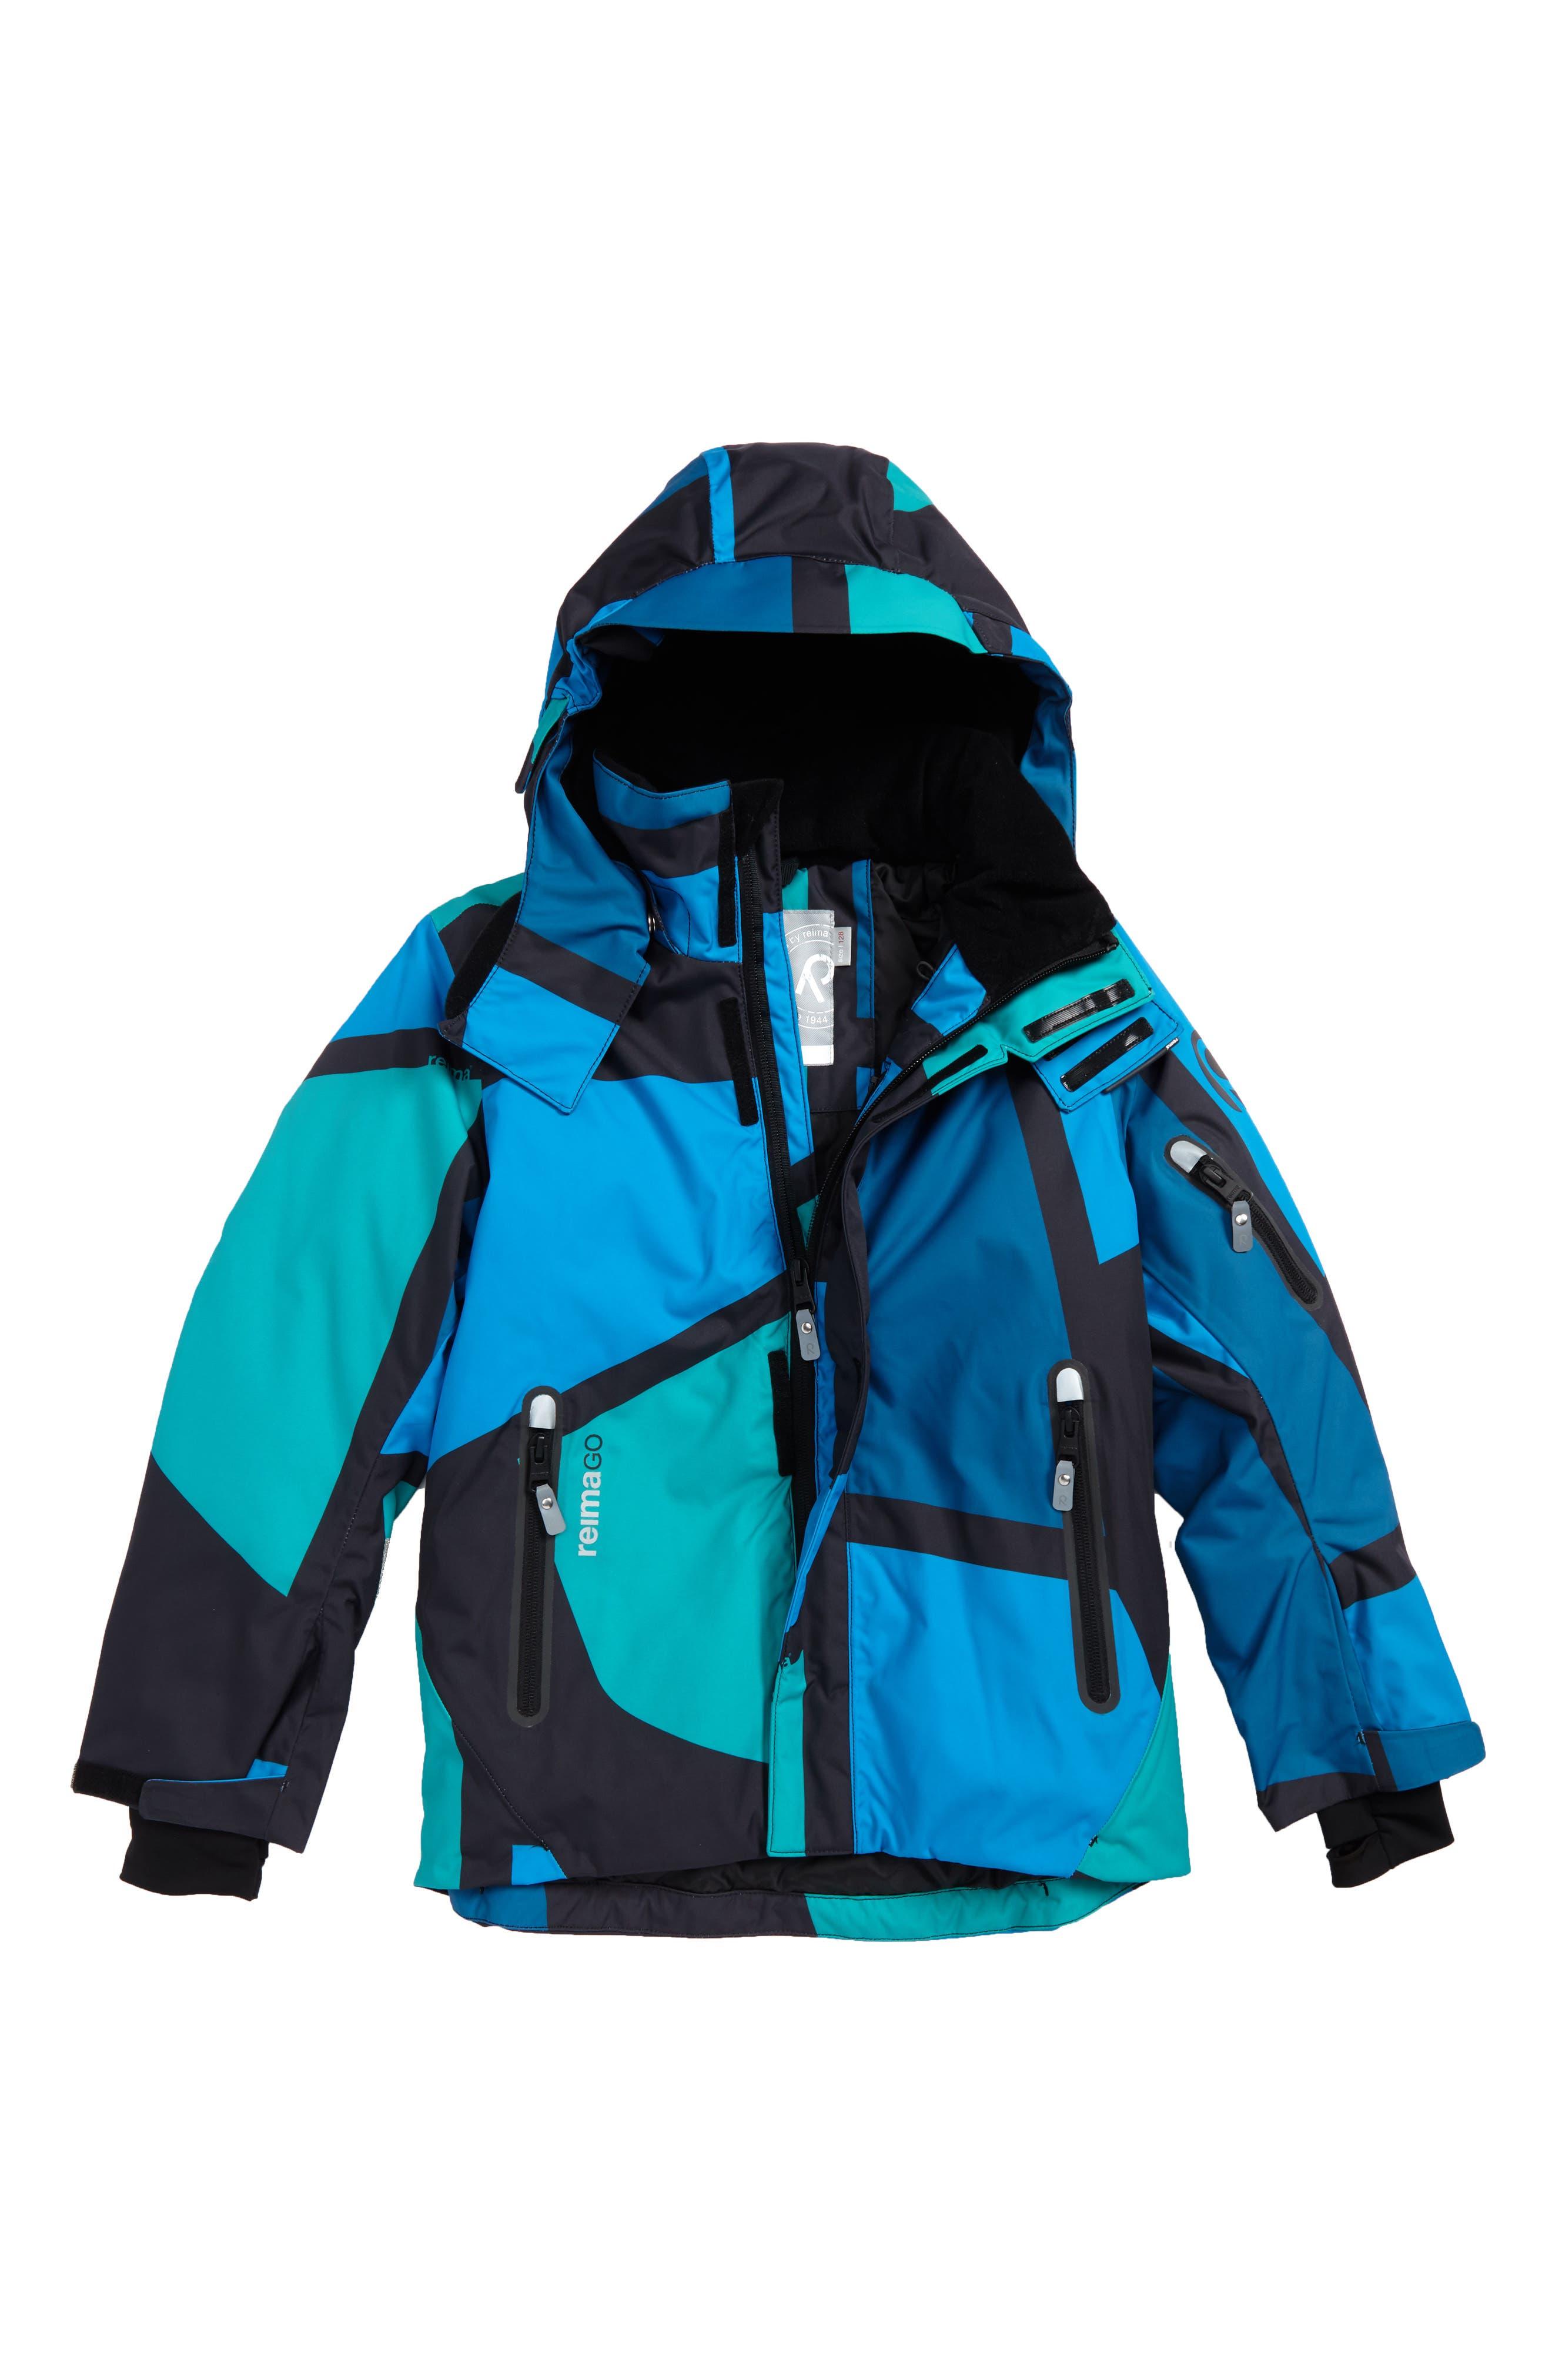 Reimatec<sup>®</sup> Wheeler Waterproof Hooded Snowsports Jacket,                             Main thumbnail 1, color,                             400